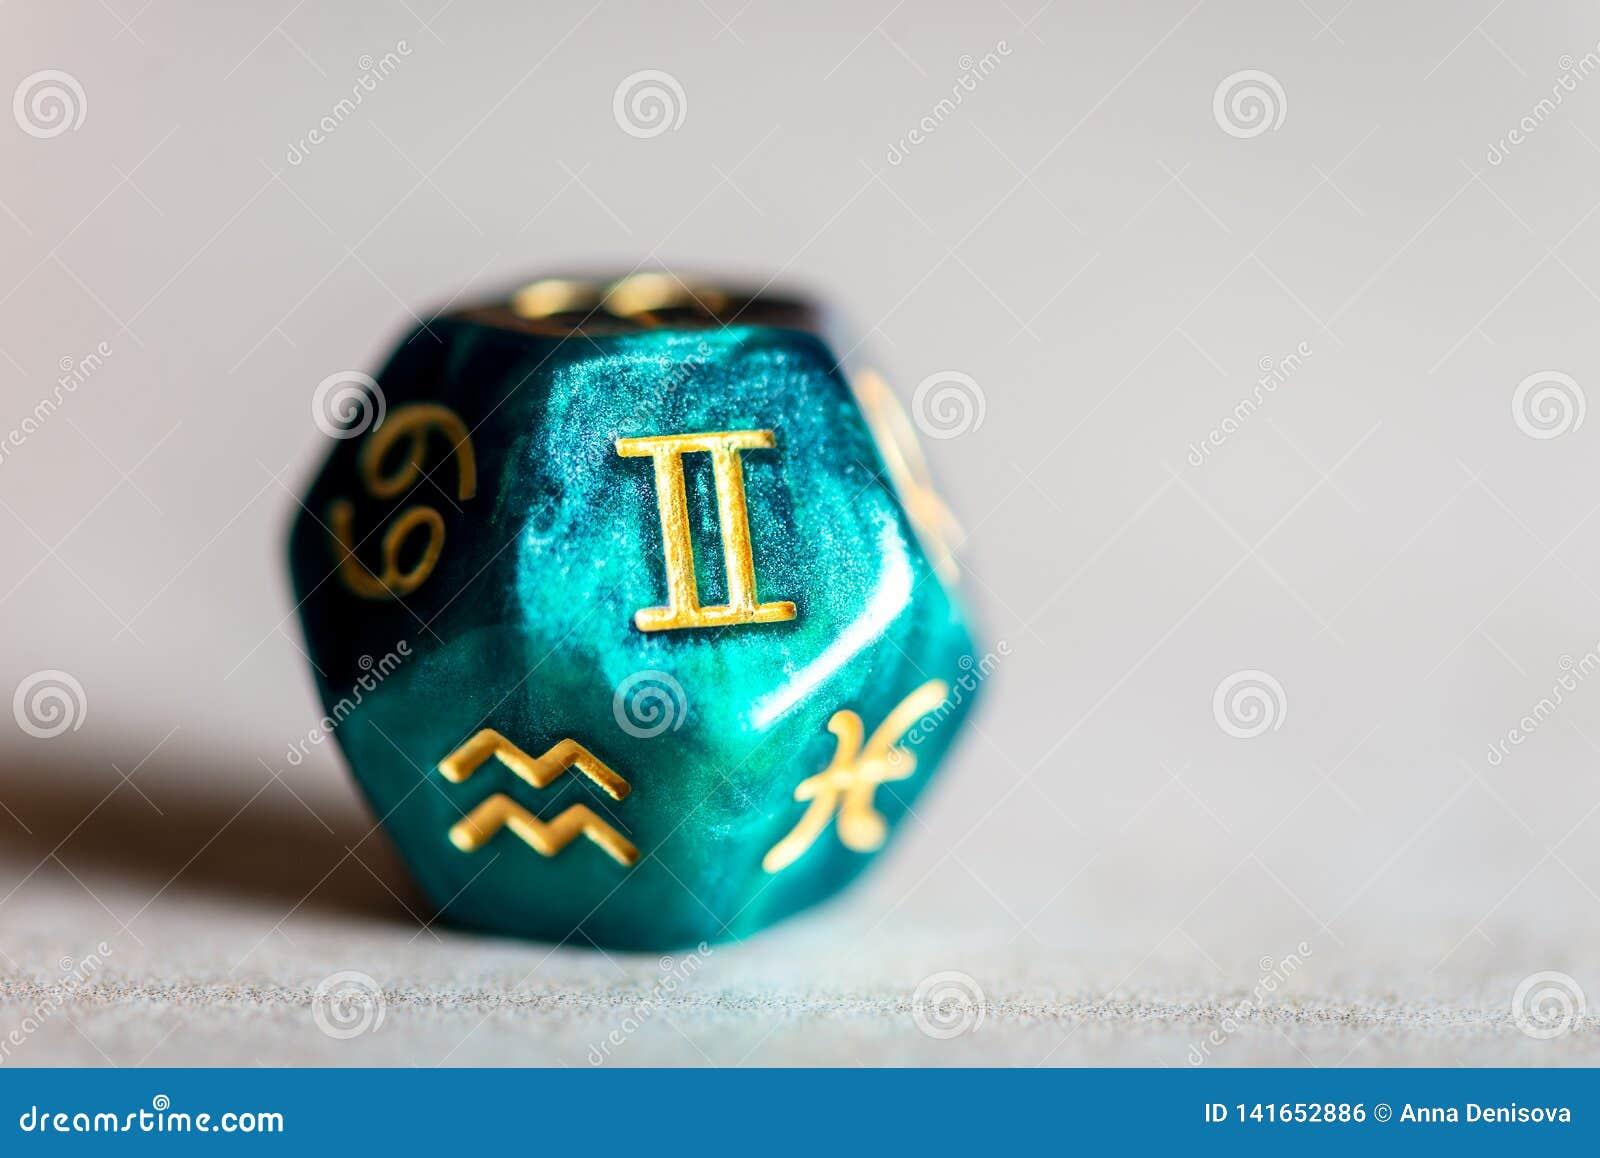 Astrology Dice with zodiac symbol of Gemini